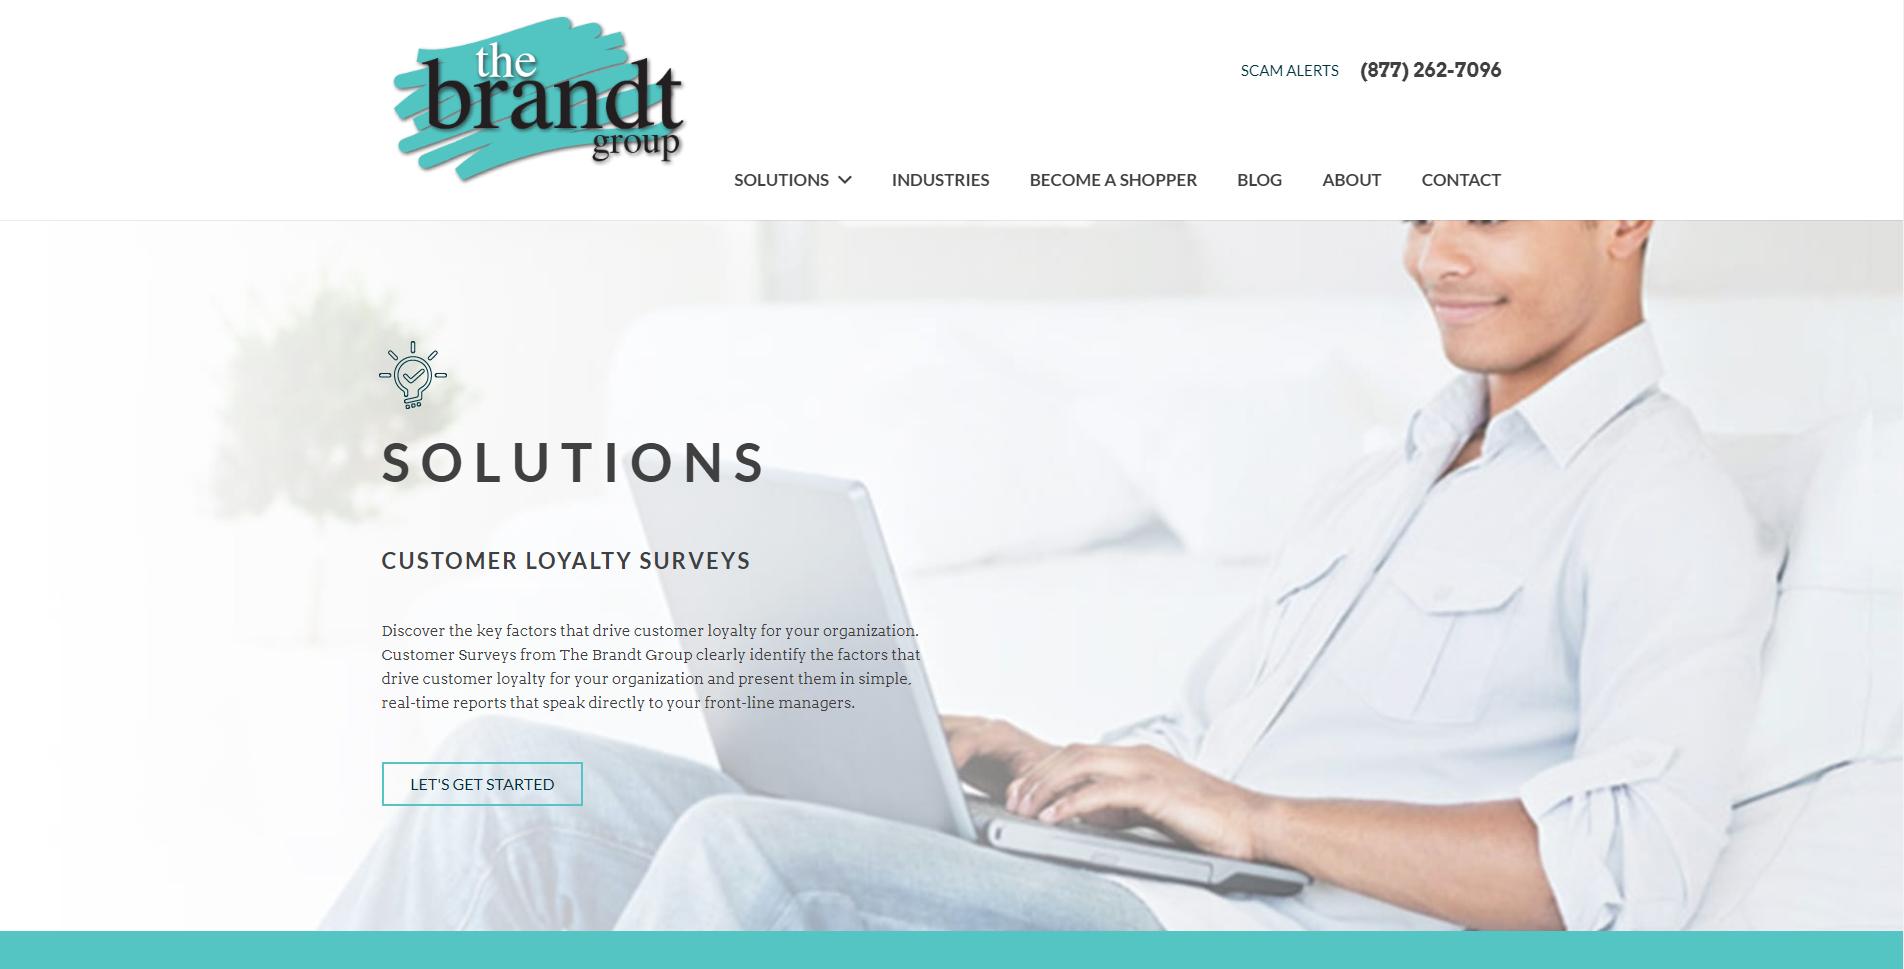 thebrandtgroup.com/customer-experience-surveys/